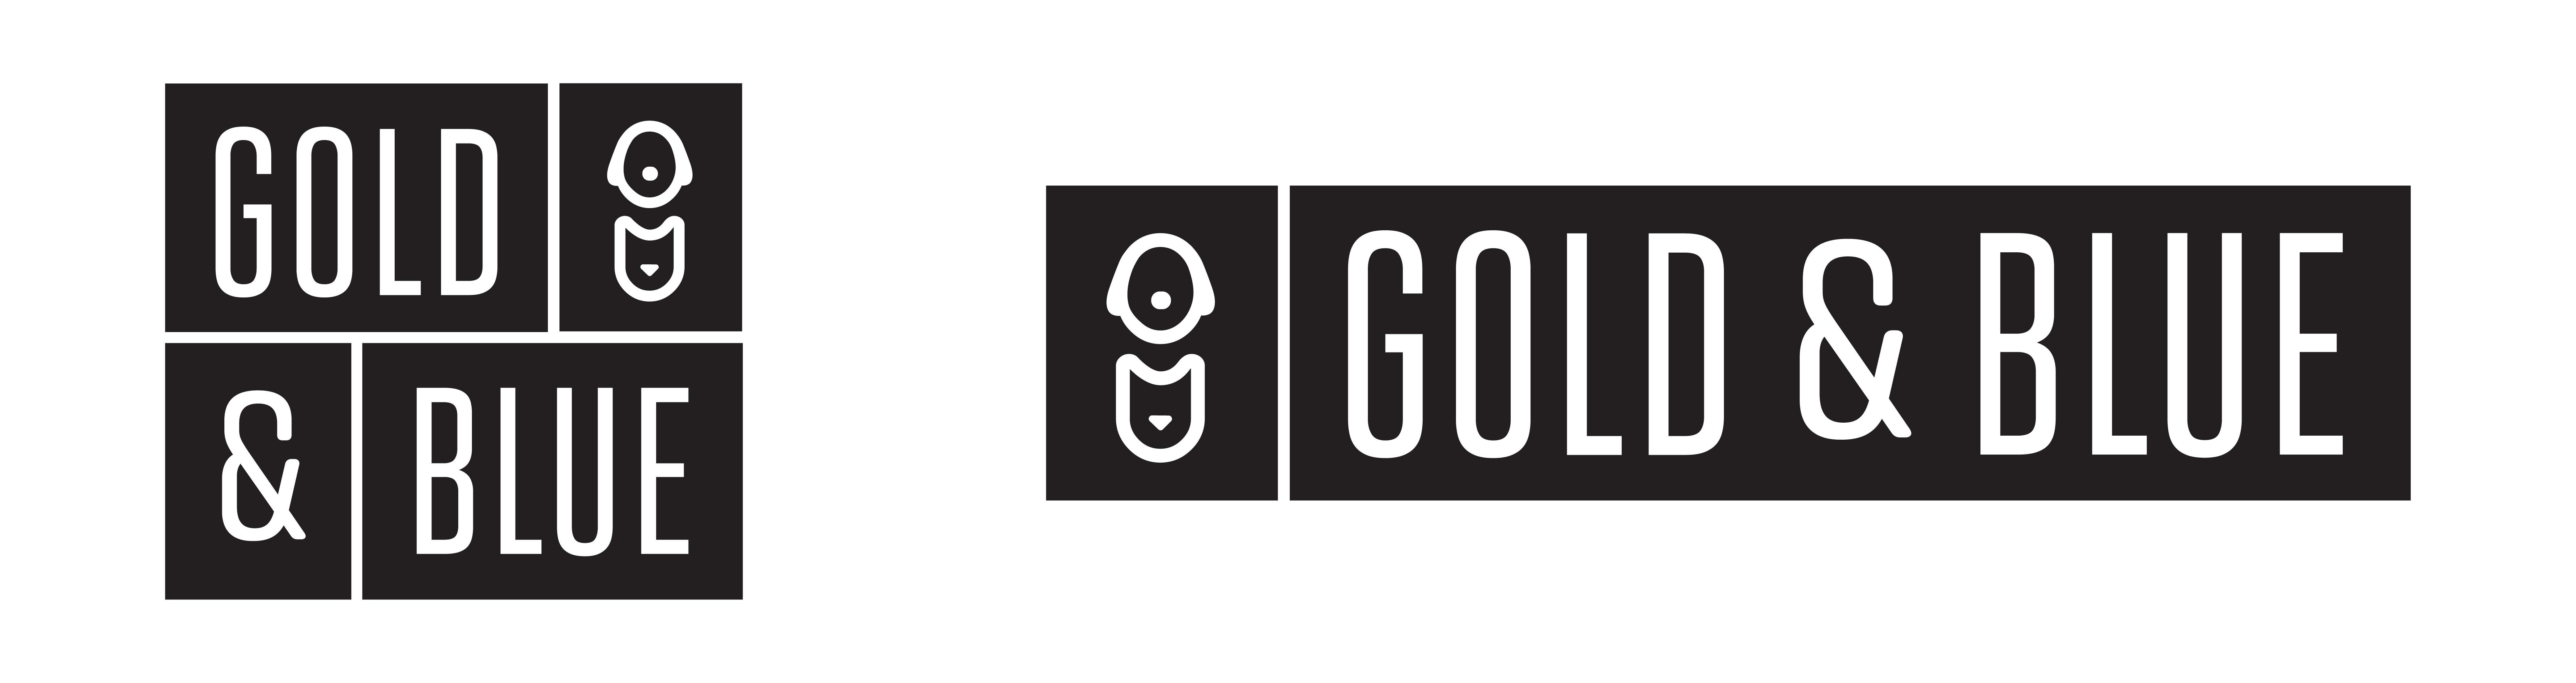 Gold and Blue Veterinary Wellness logo design